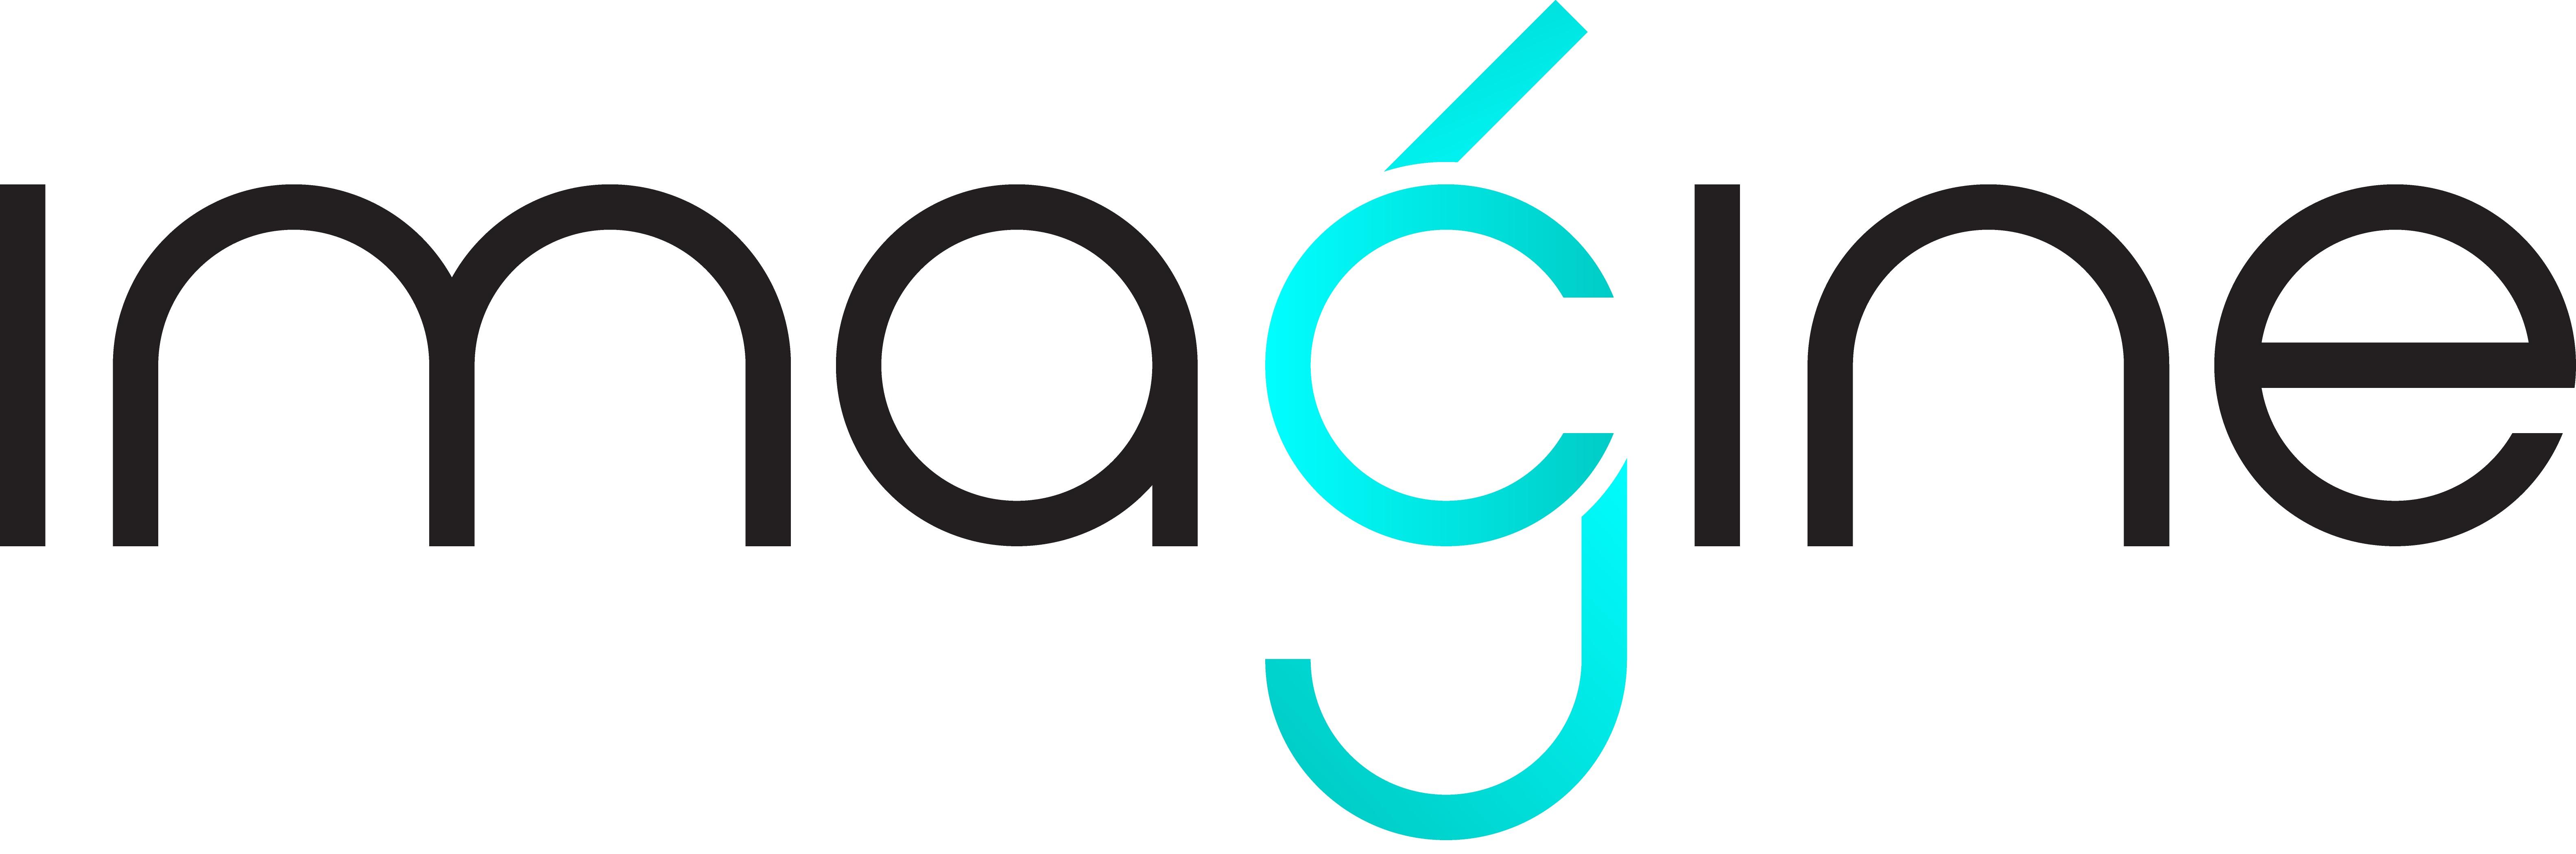 imagine production ltd Logo